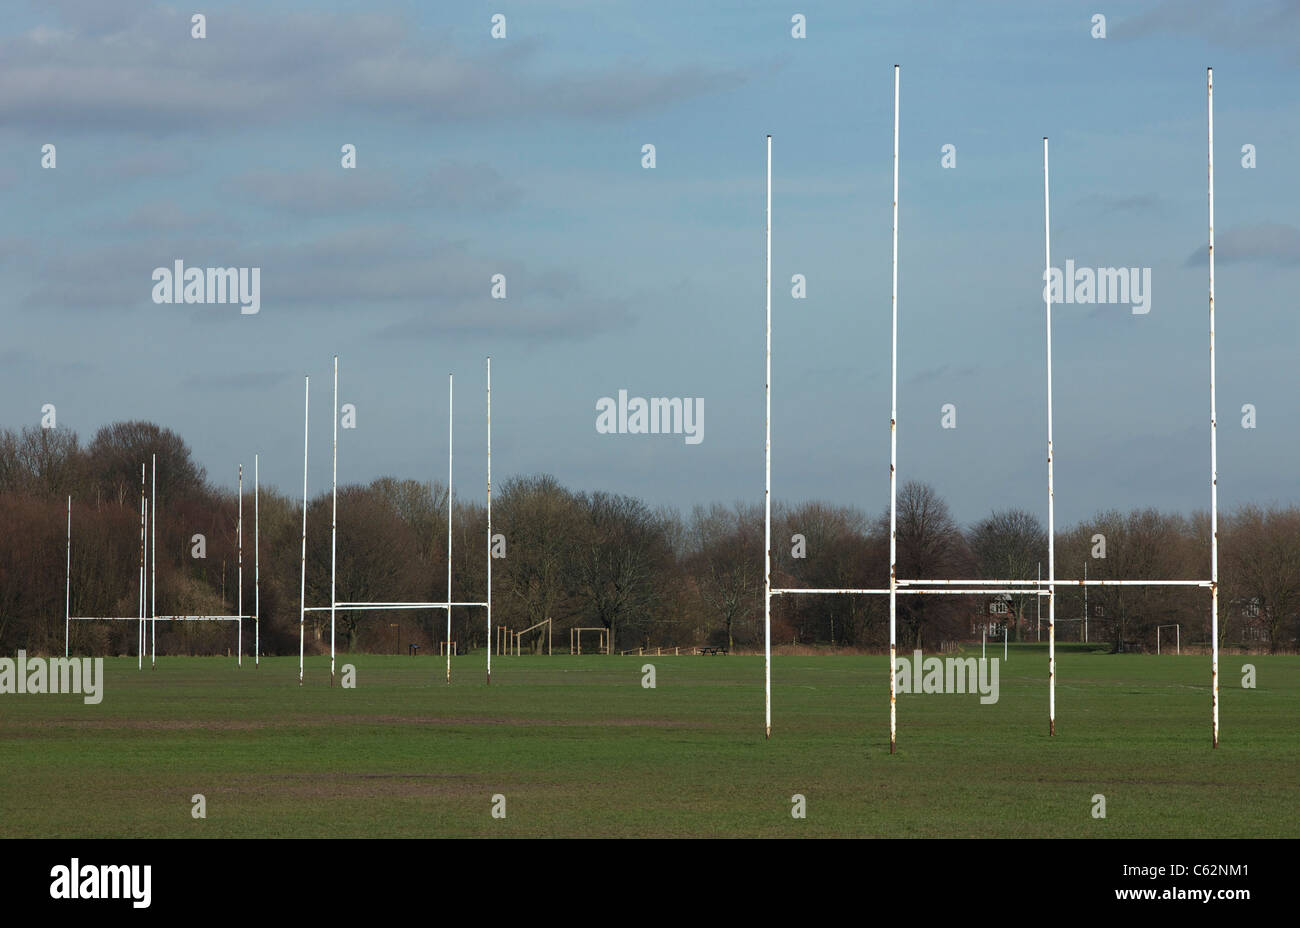 Rugby posti sulle falde adiacenti Immagini Stock